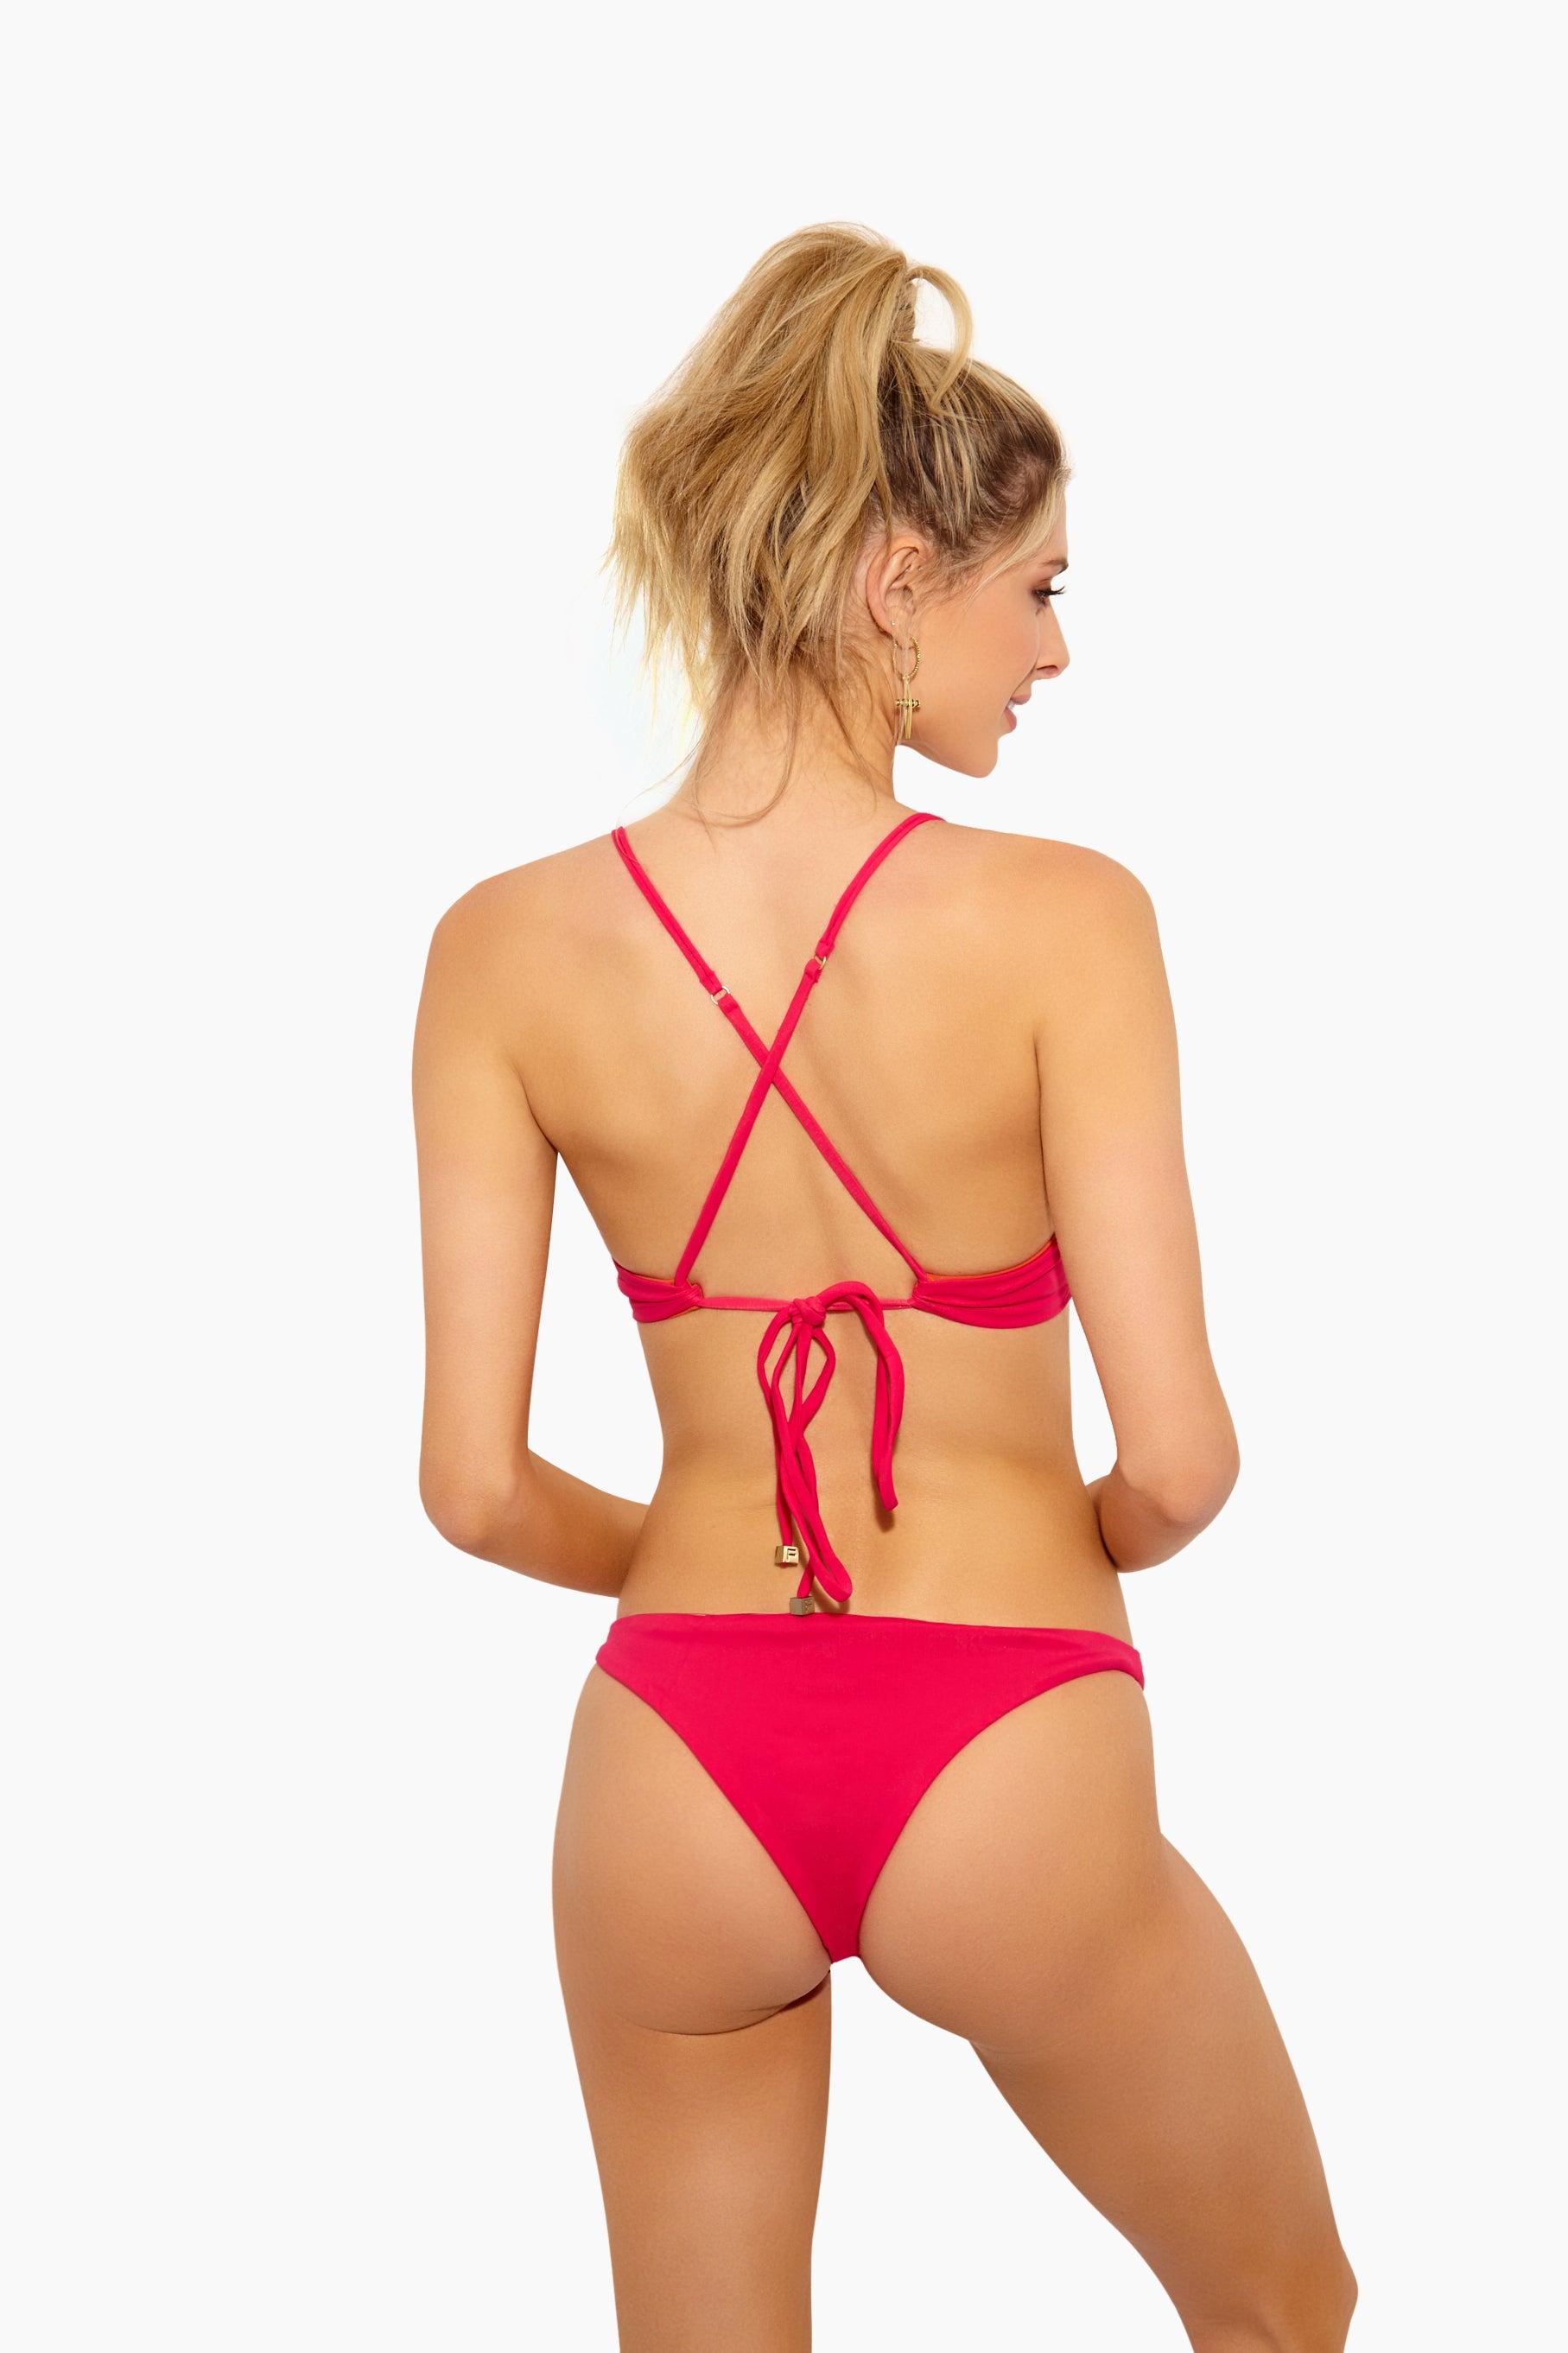 FELLA William Shakespeare Sporty Bikini Top - Fresia Bikini Top   Fresia William Shakespeare Top - Features:  Sporty Top  Thin Spaghetti Straps Criss Cross Back Ties at Center Back